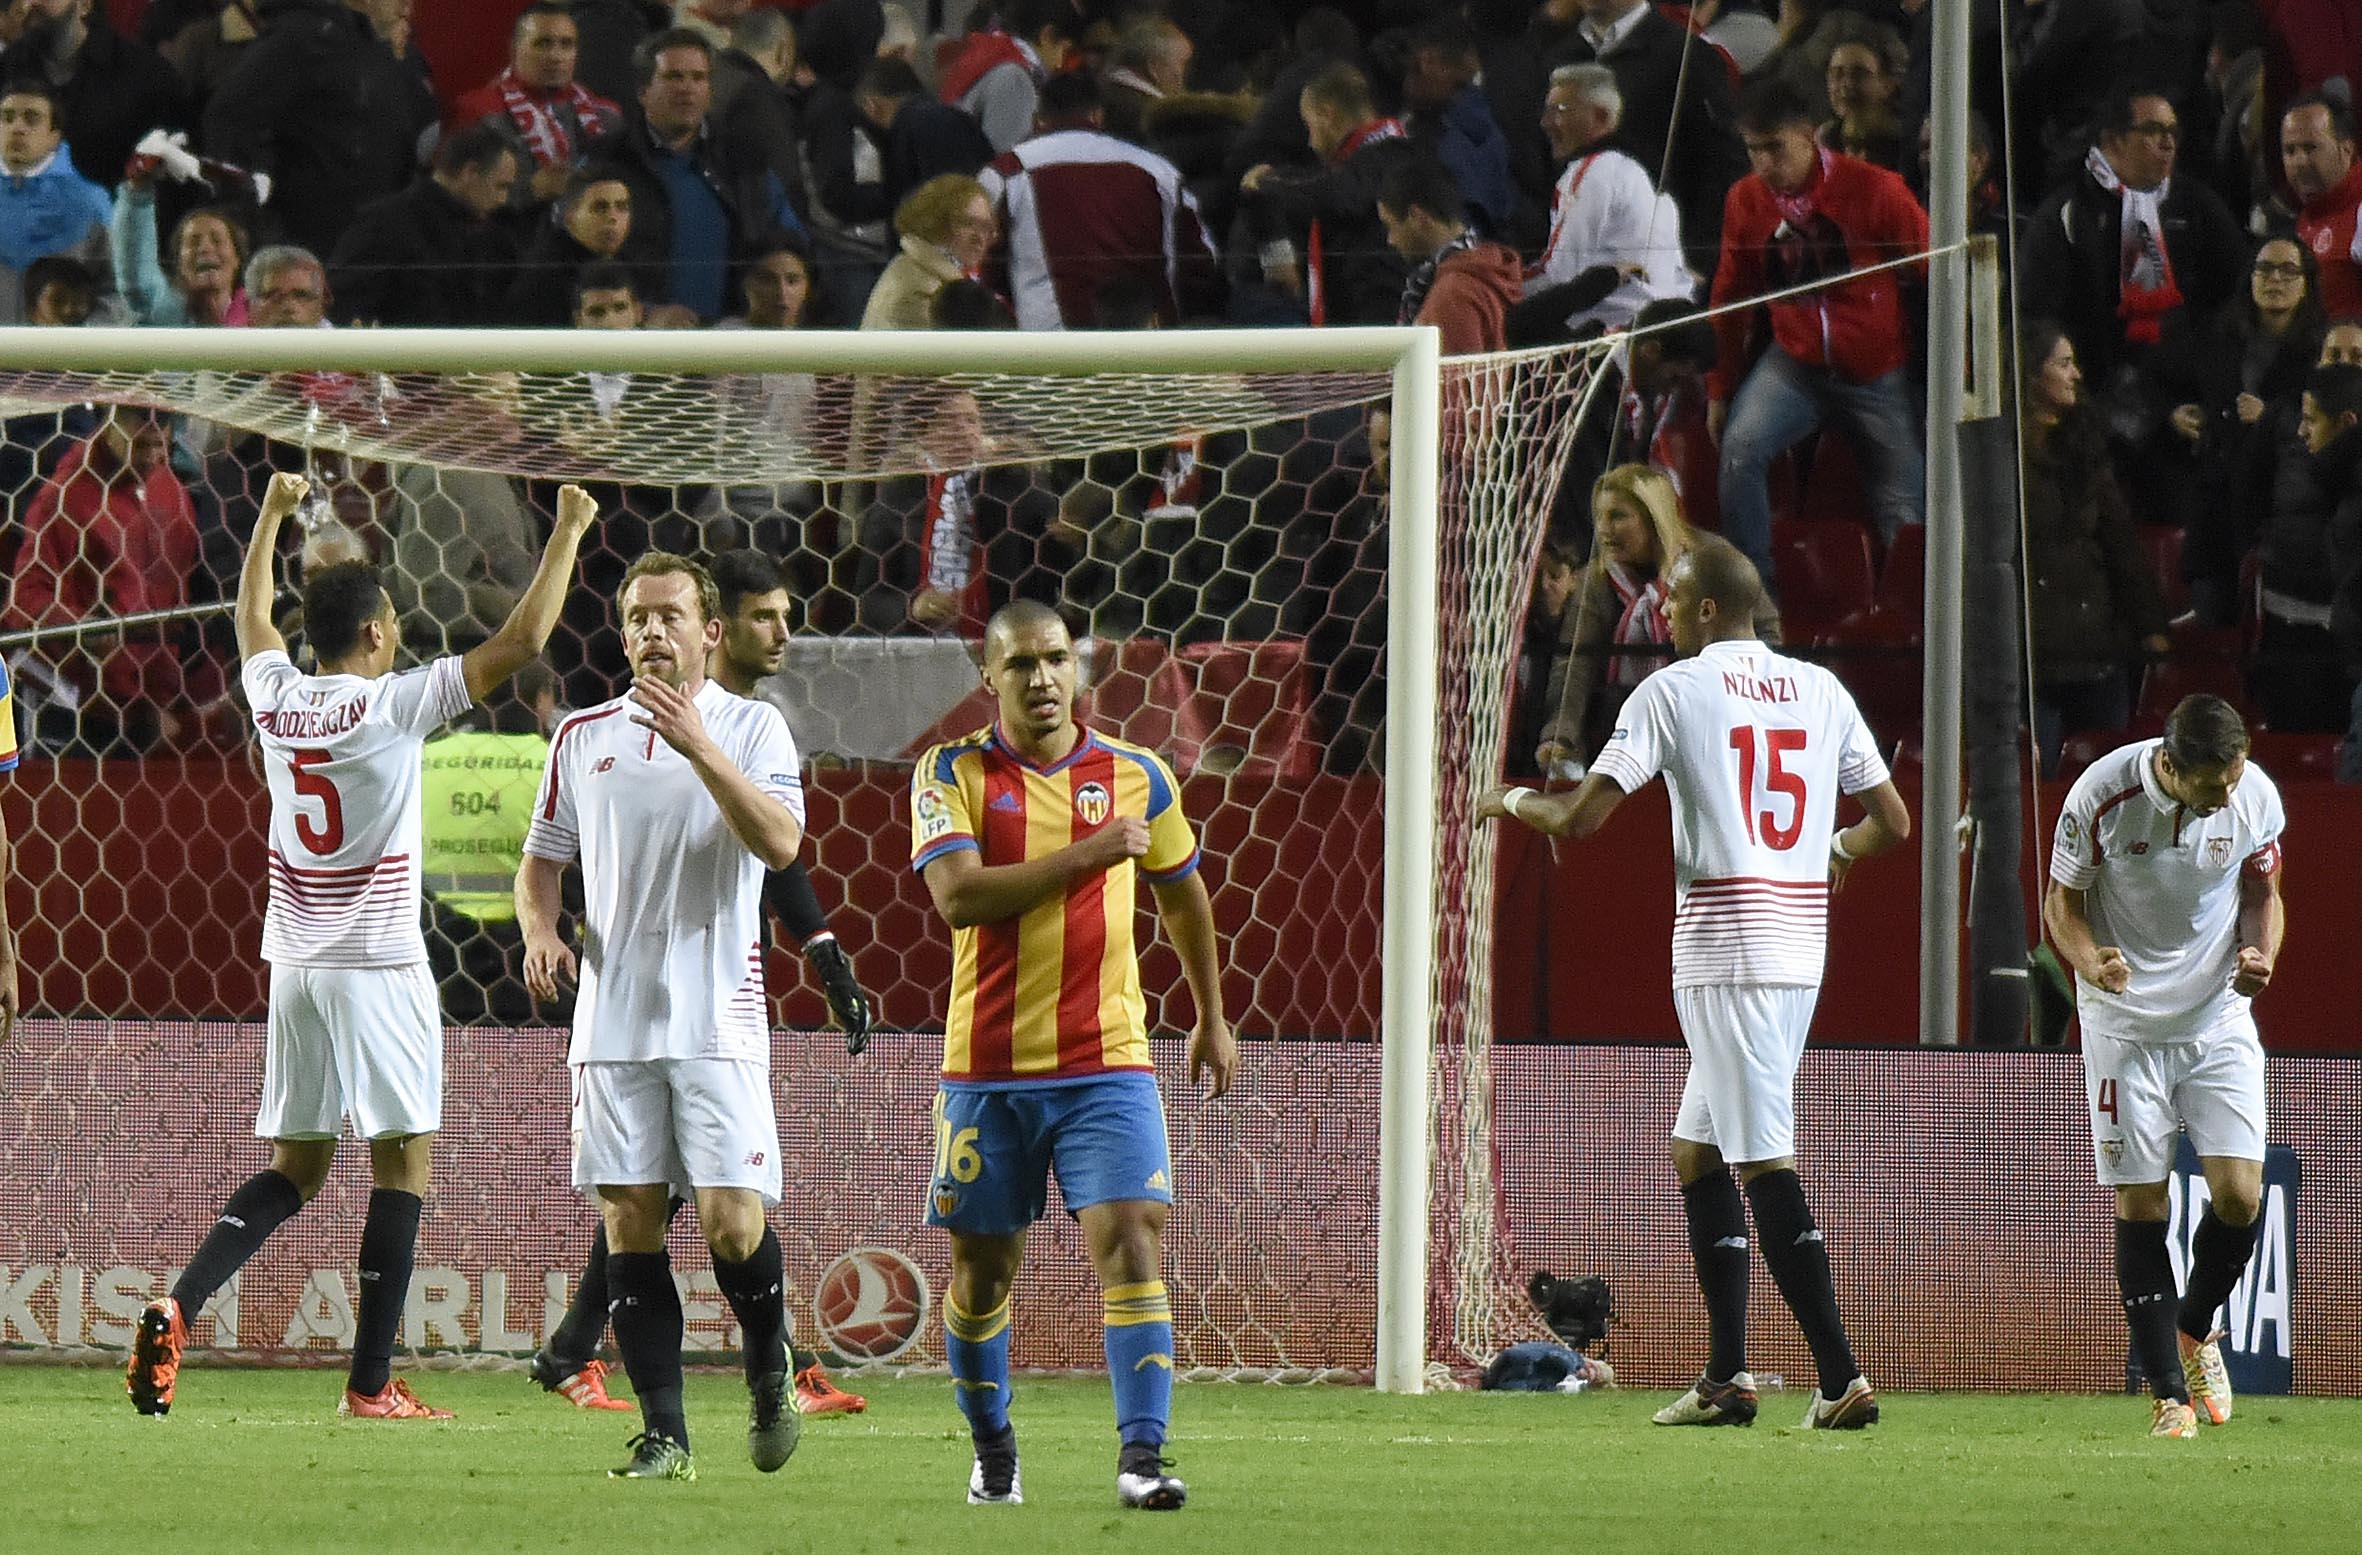 Imagen del final del partido del Sevilla FC-Valencia CF